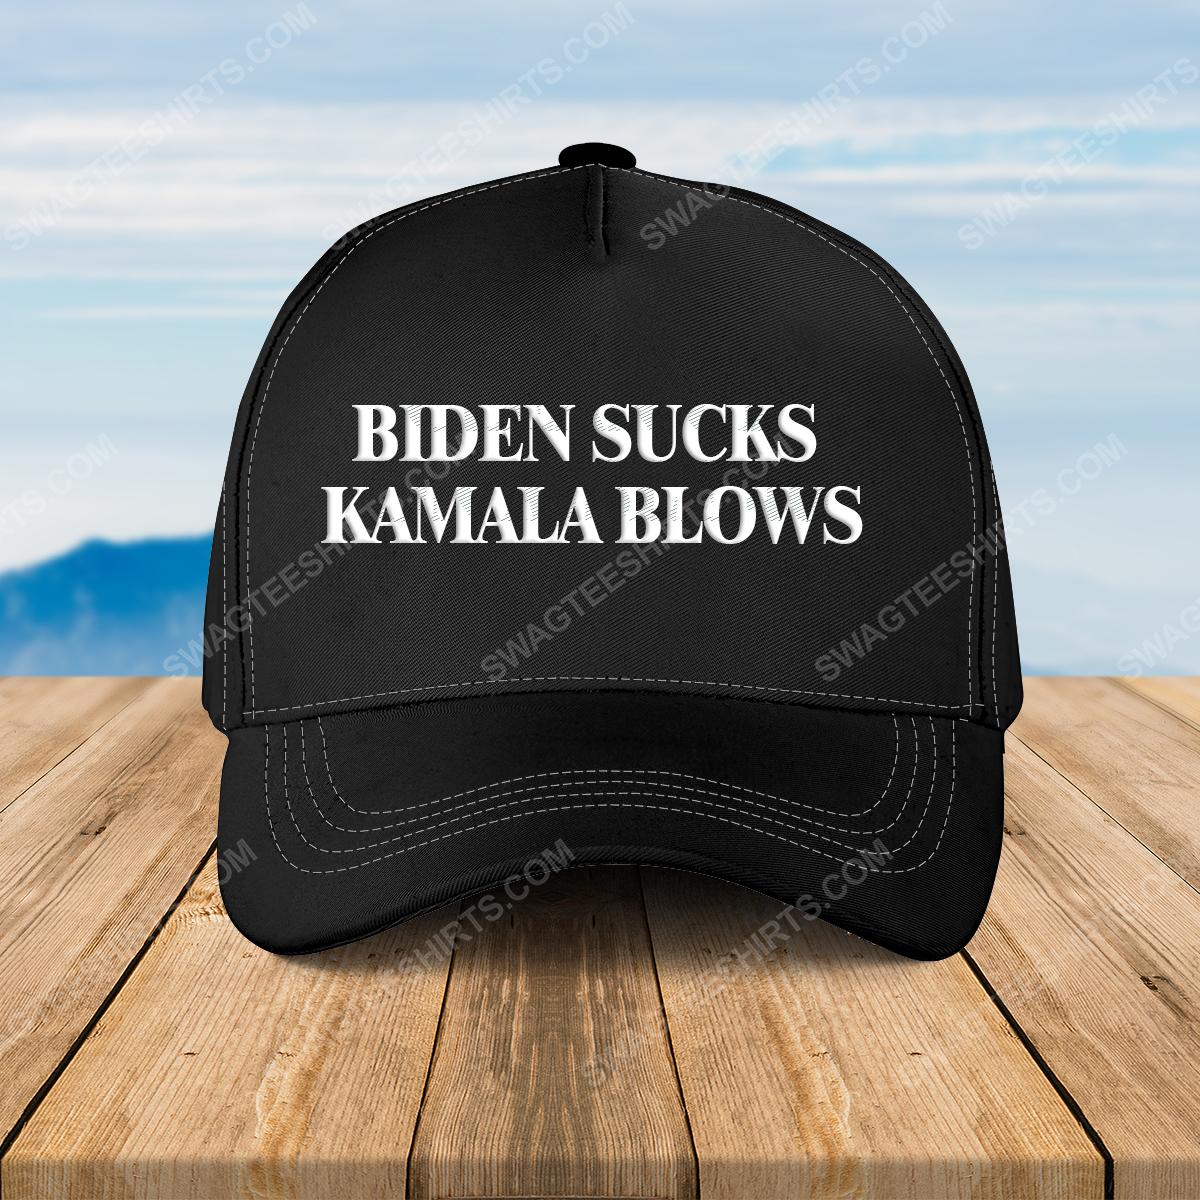 Biden sucks kamala blows full print classic hat